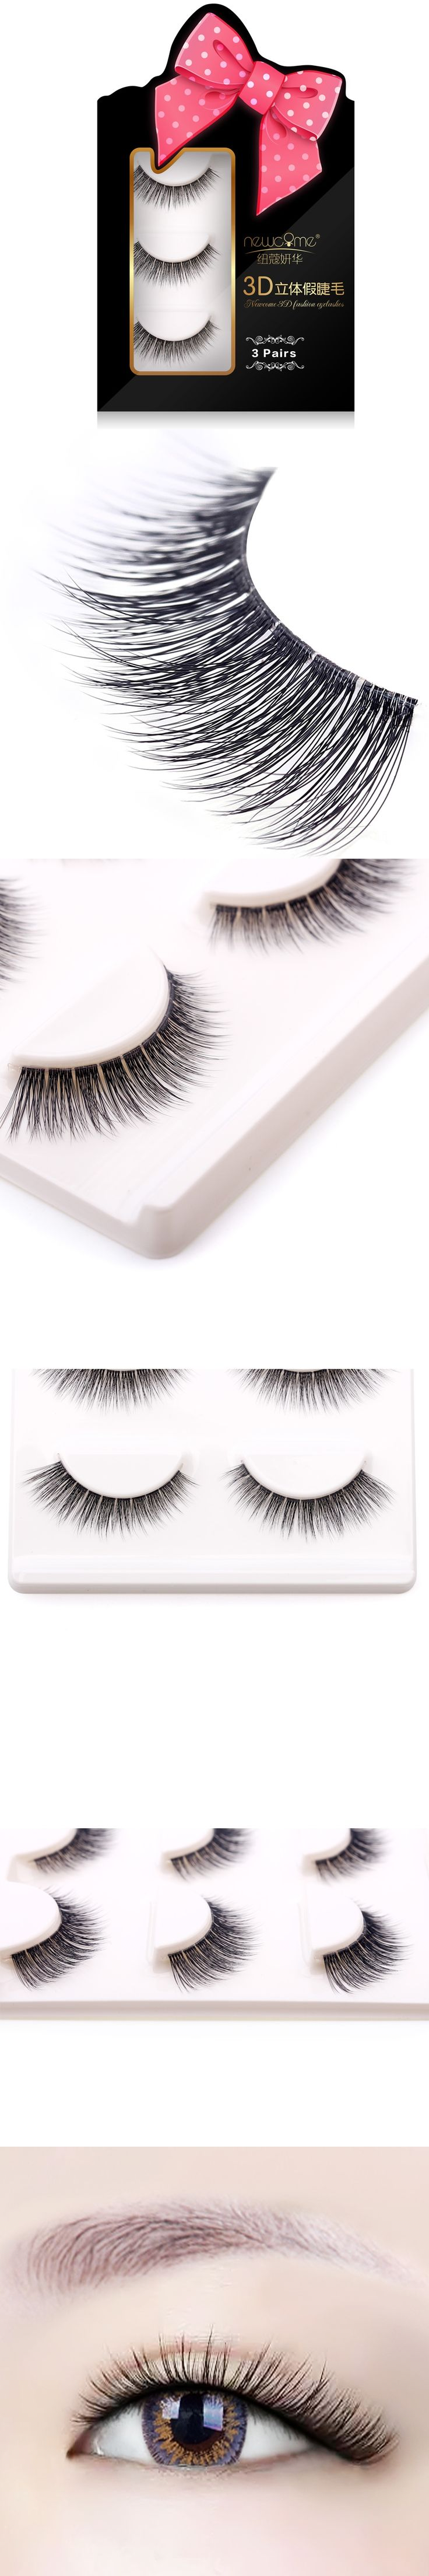 3 Pairs 3D Handmade Thick Mink Eyelashes Natural False Eyelashes for Beauty Makeup fake Eye Lashes Extension-1